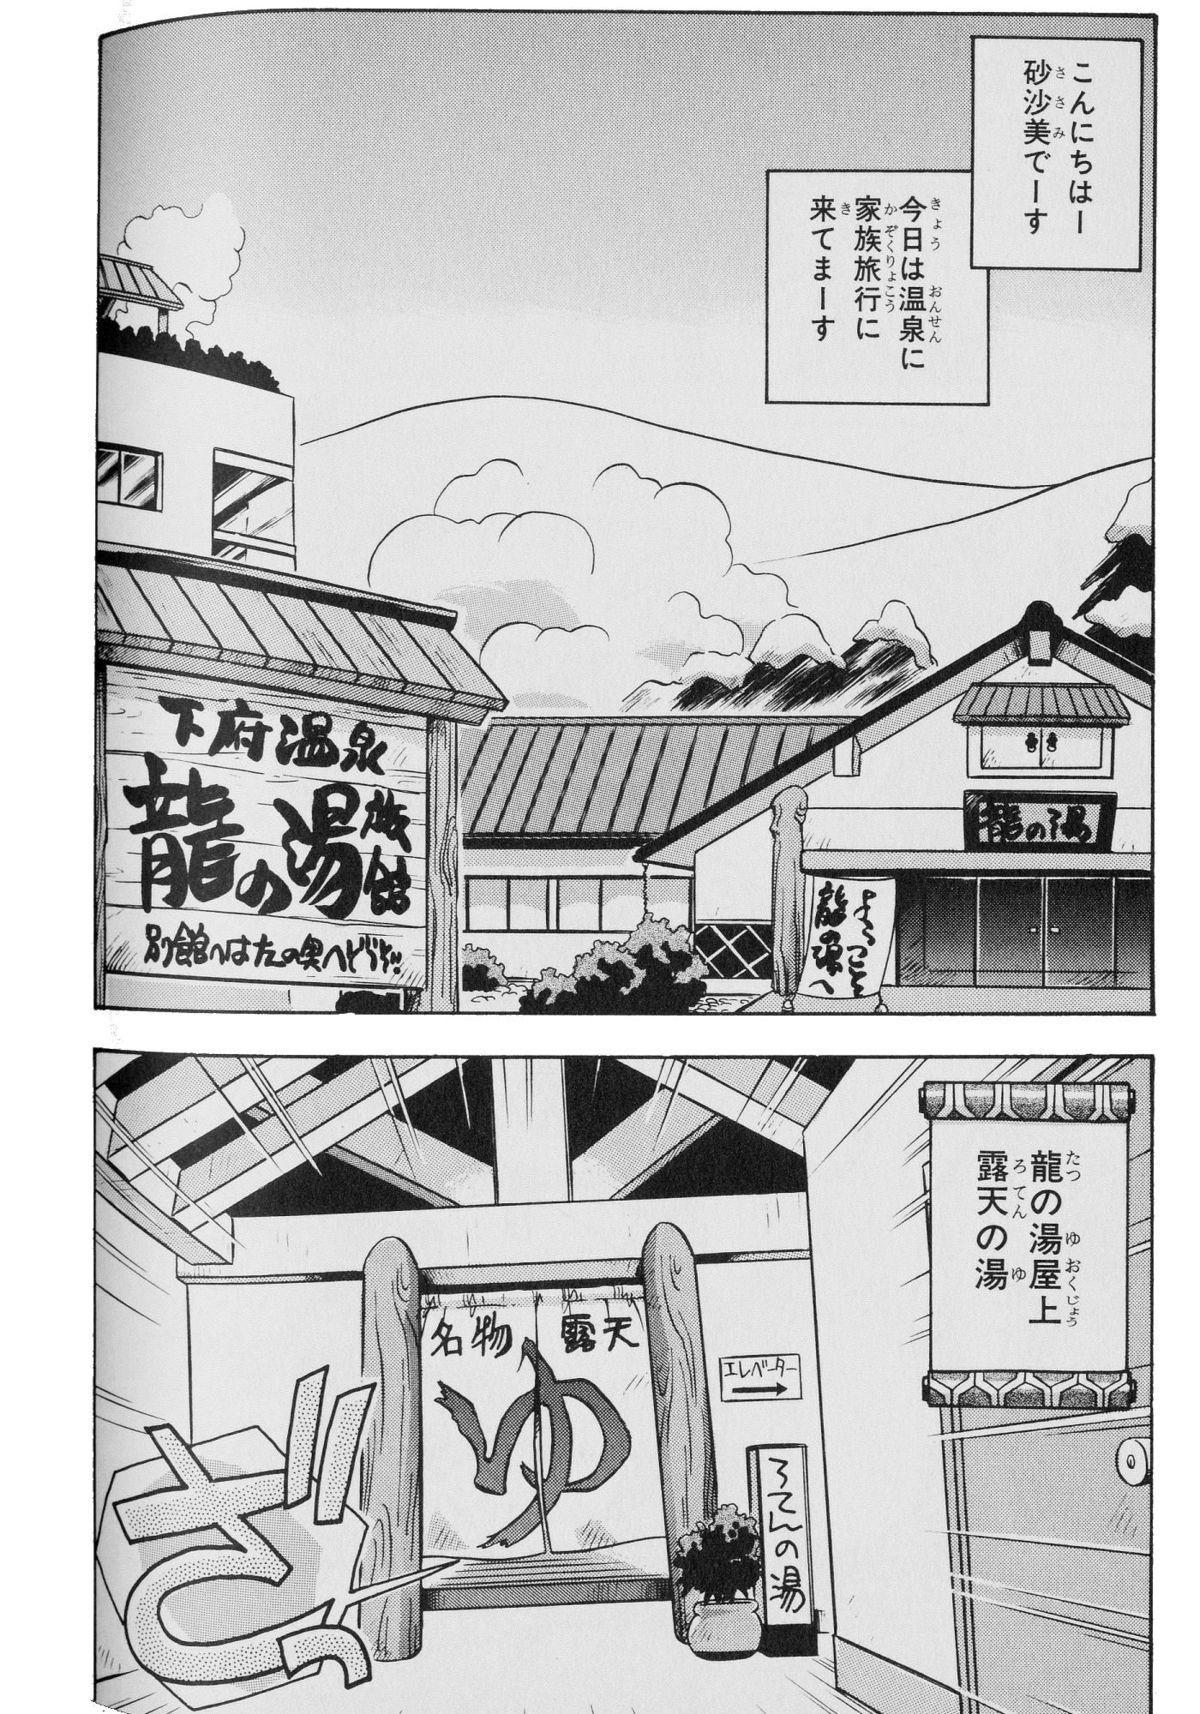 PRETTY SAMY - TATAKAU ONSEN 2